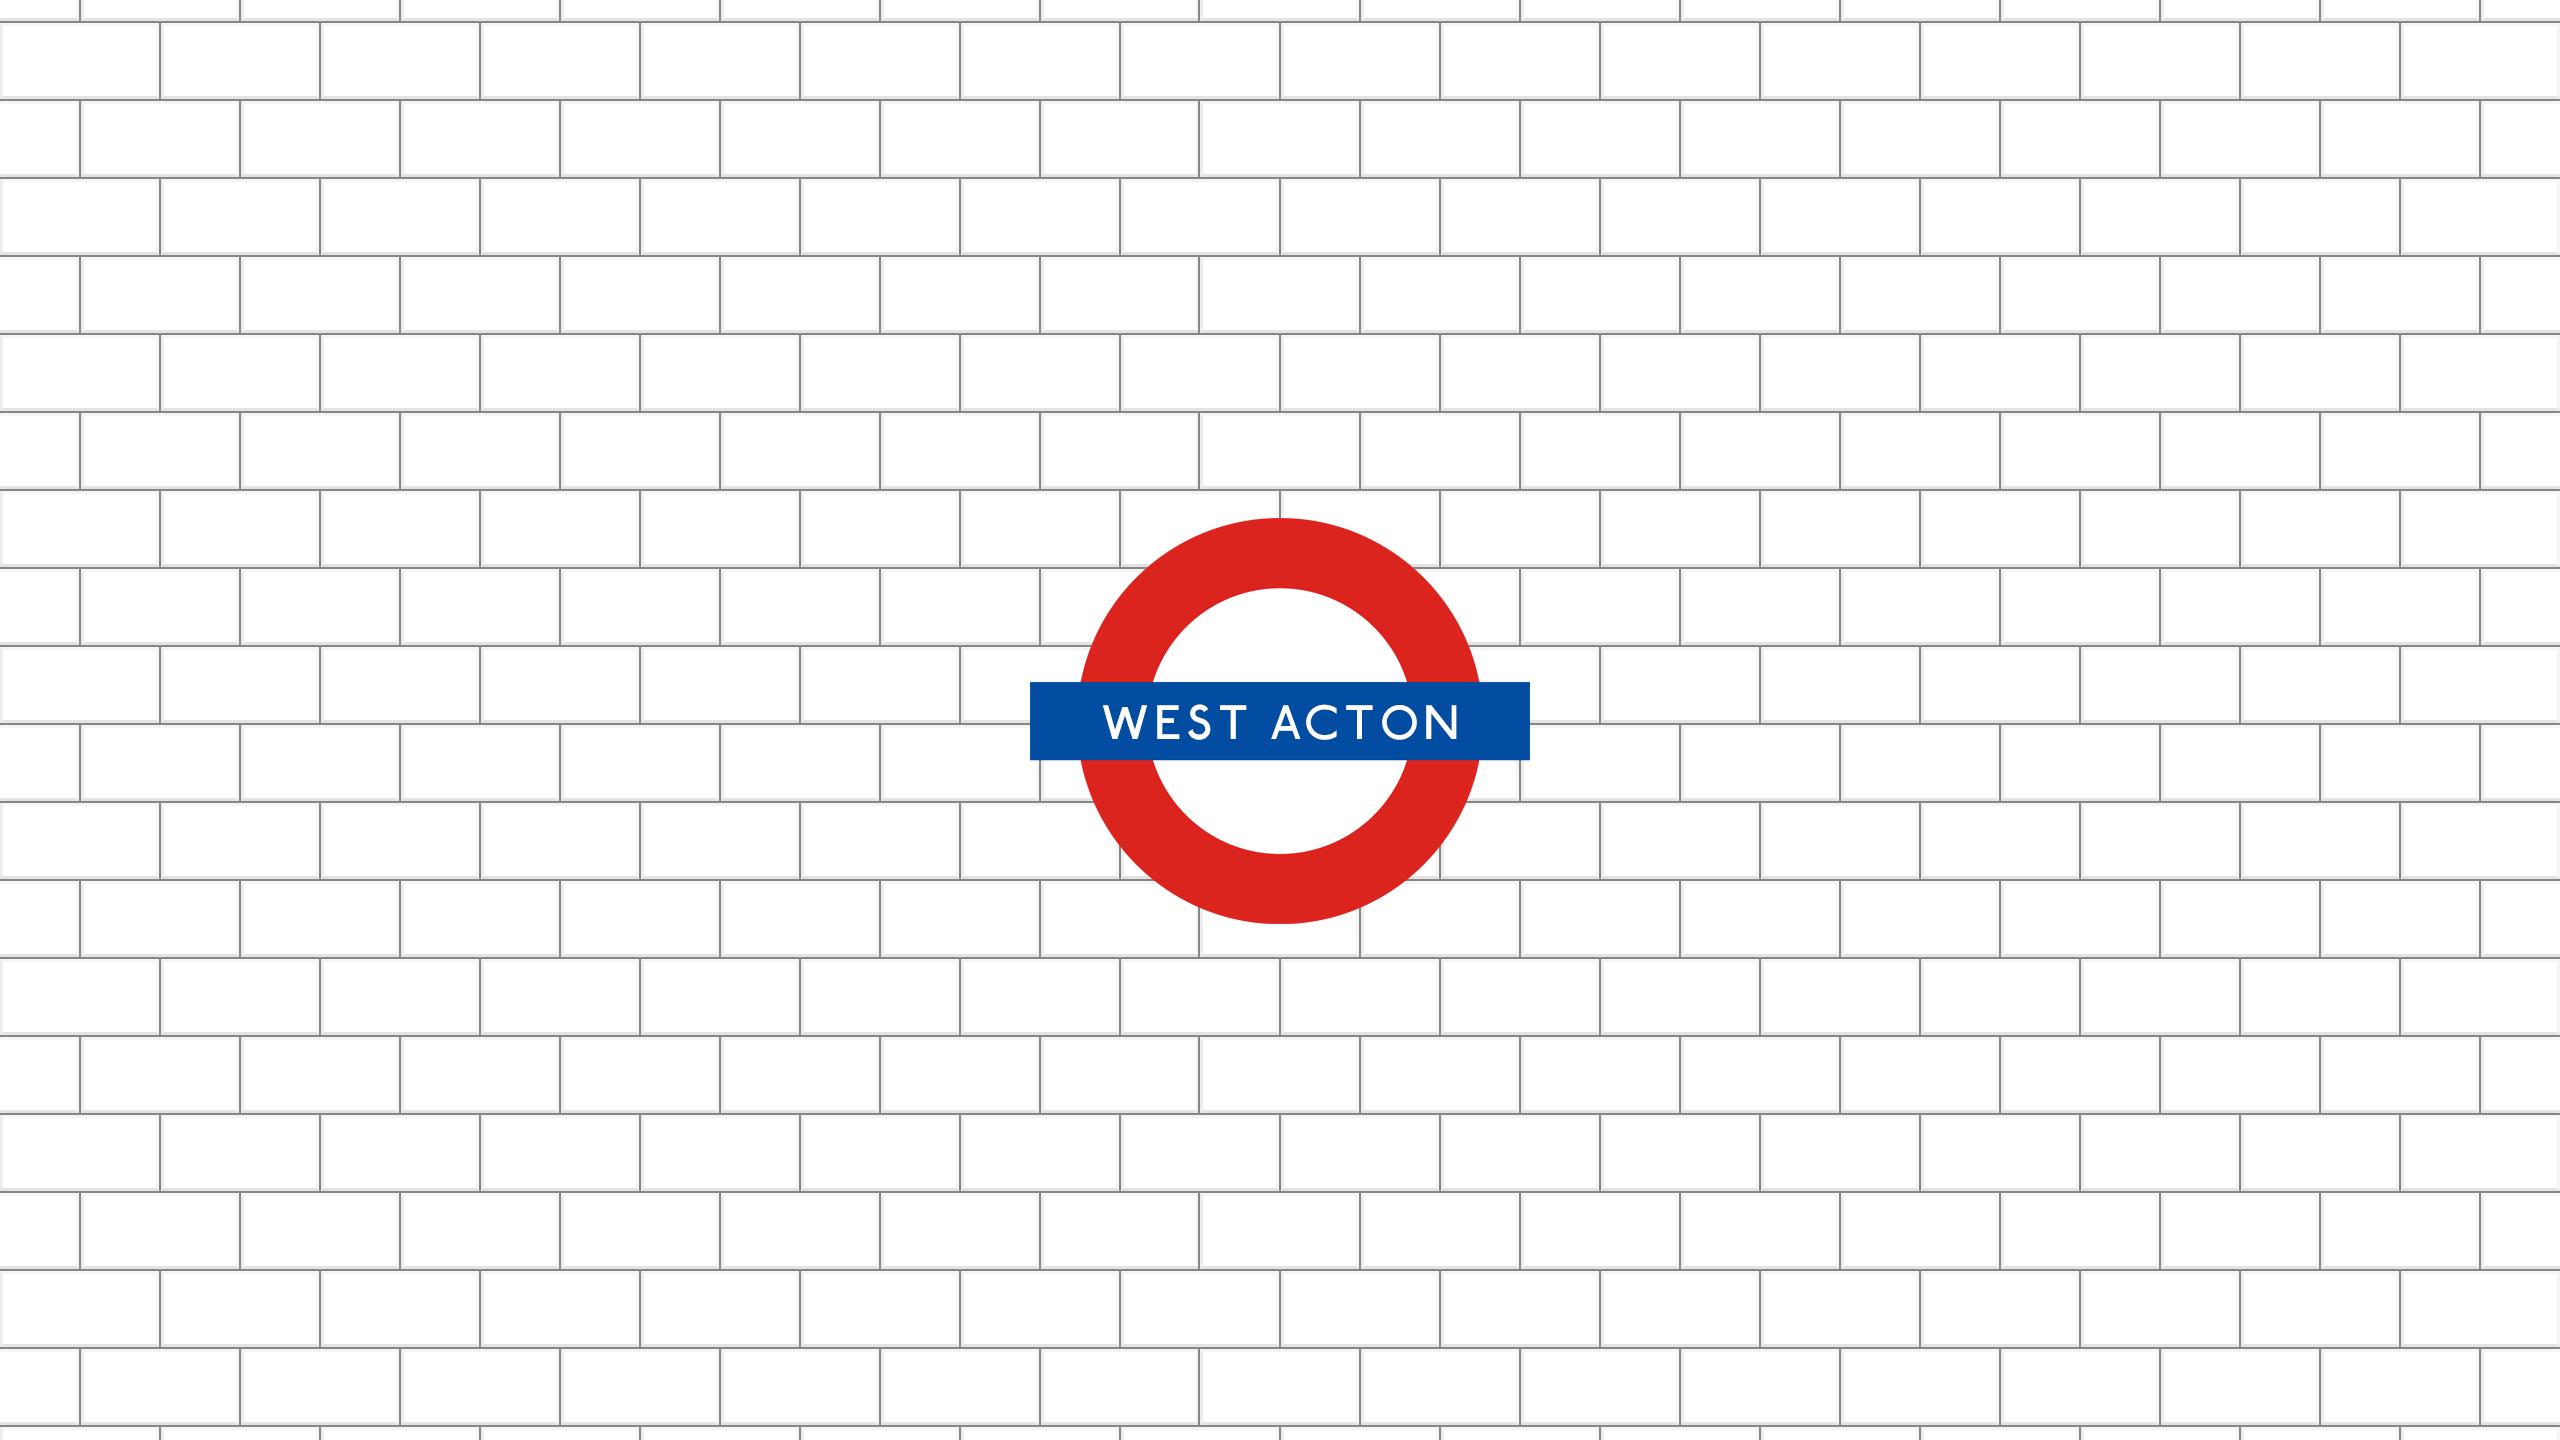 West Acton